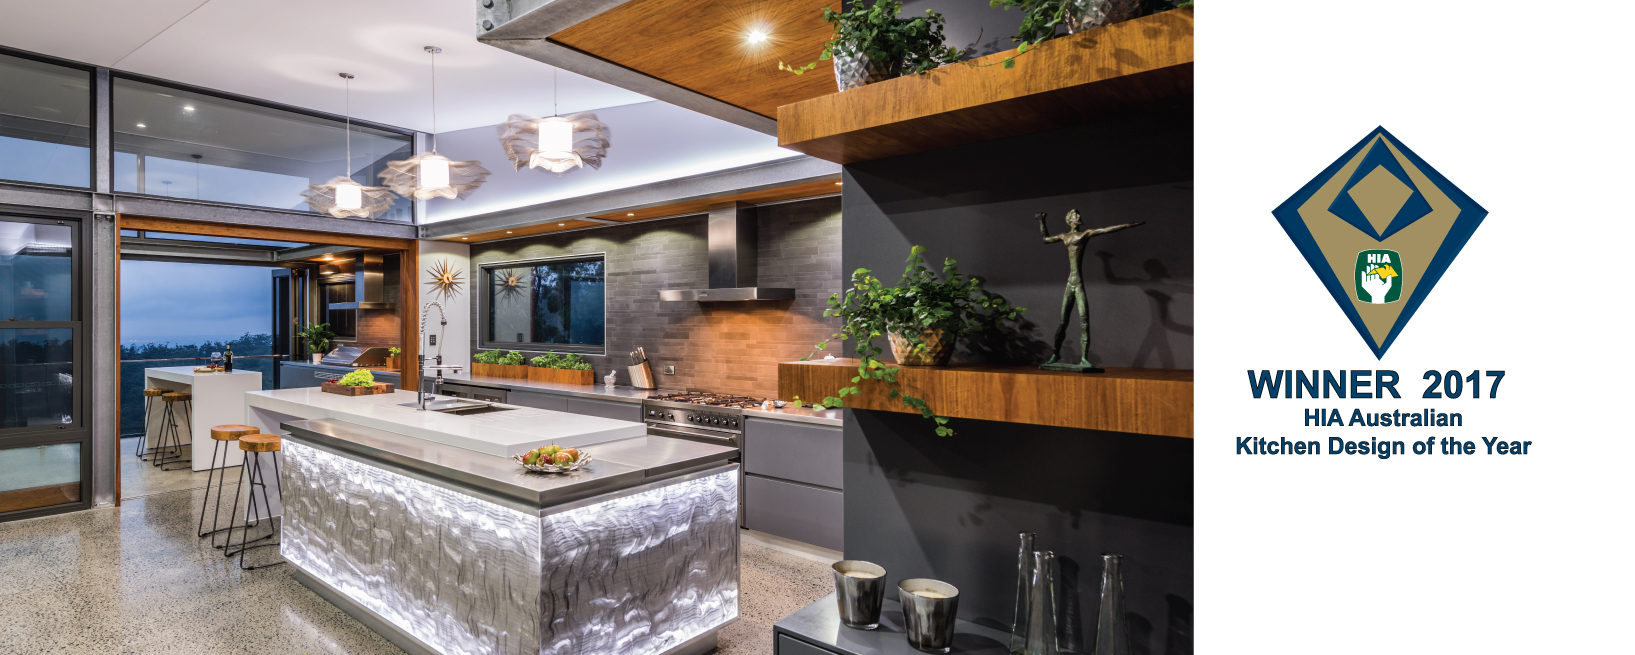 HIA-Australian-Kitchen-Design-of-theYear